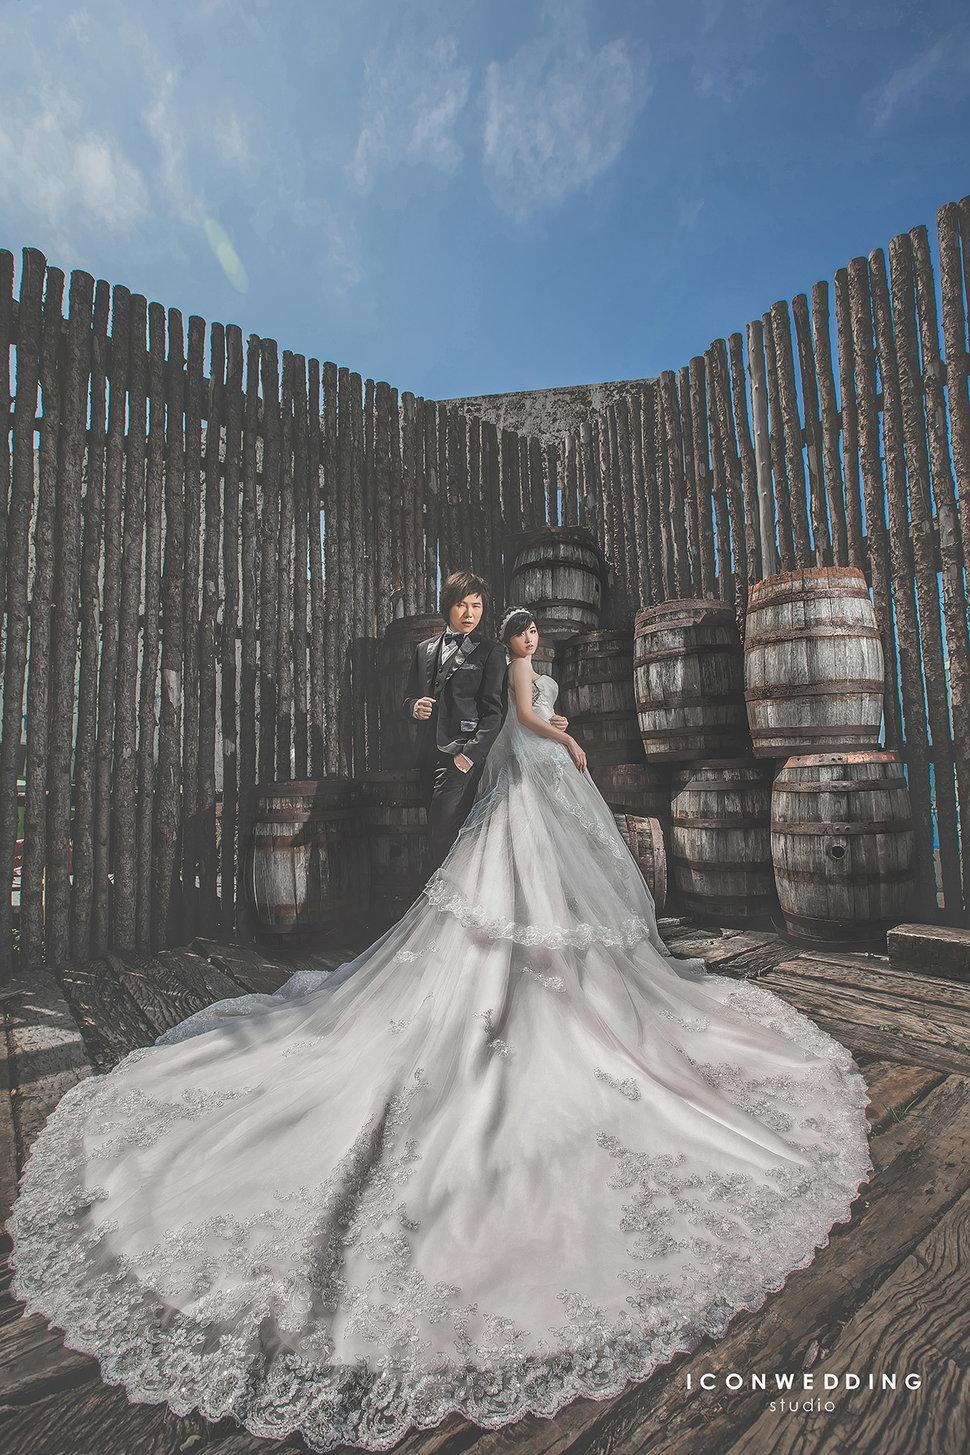 AD7X6697 - 愛情符號 ‧ 玩拍婚紗 ‧ 海外婚紗 - 結婚吧一站式婚禮服務平台